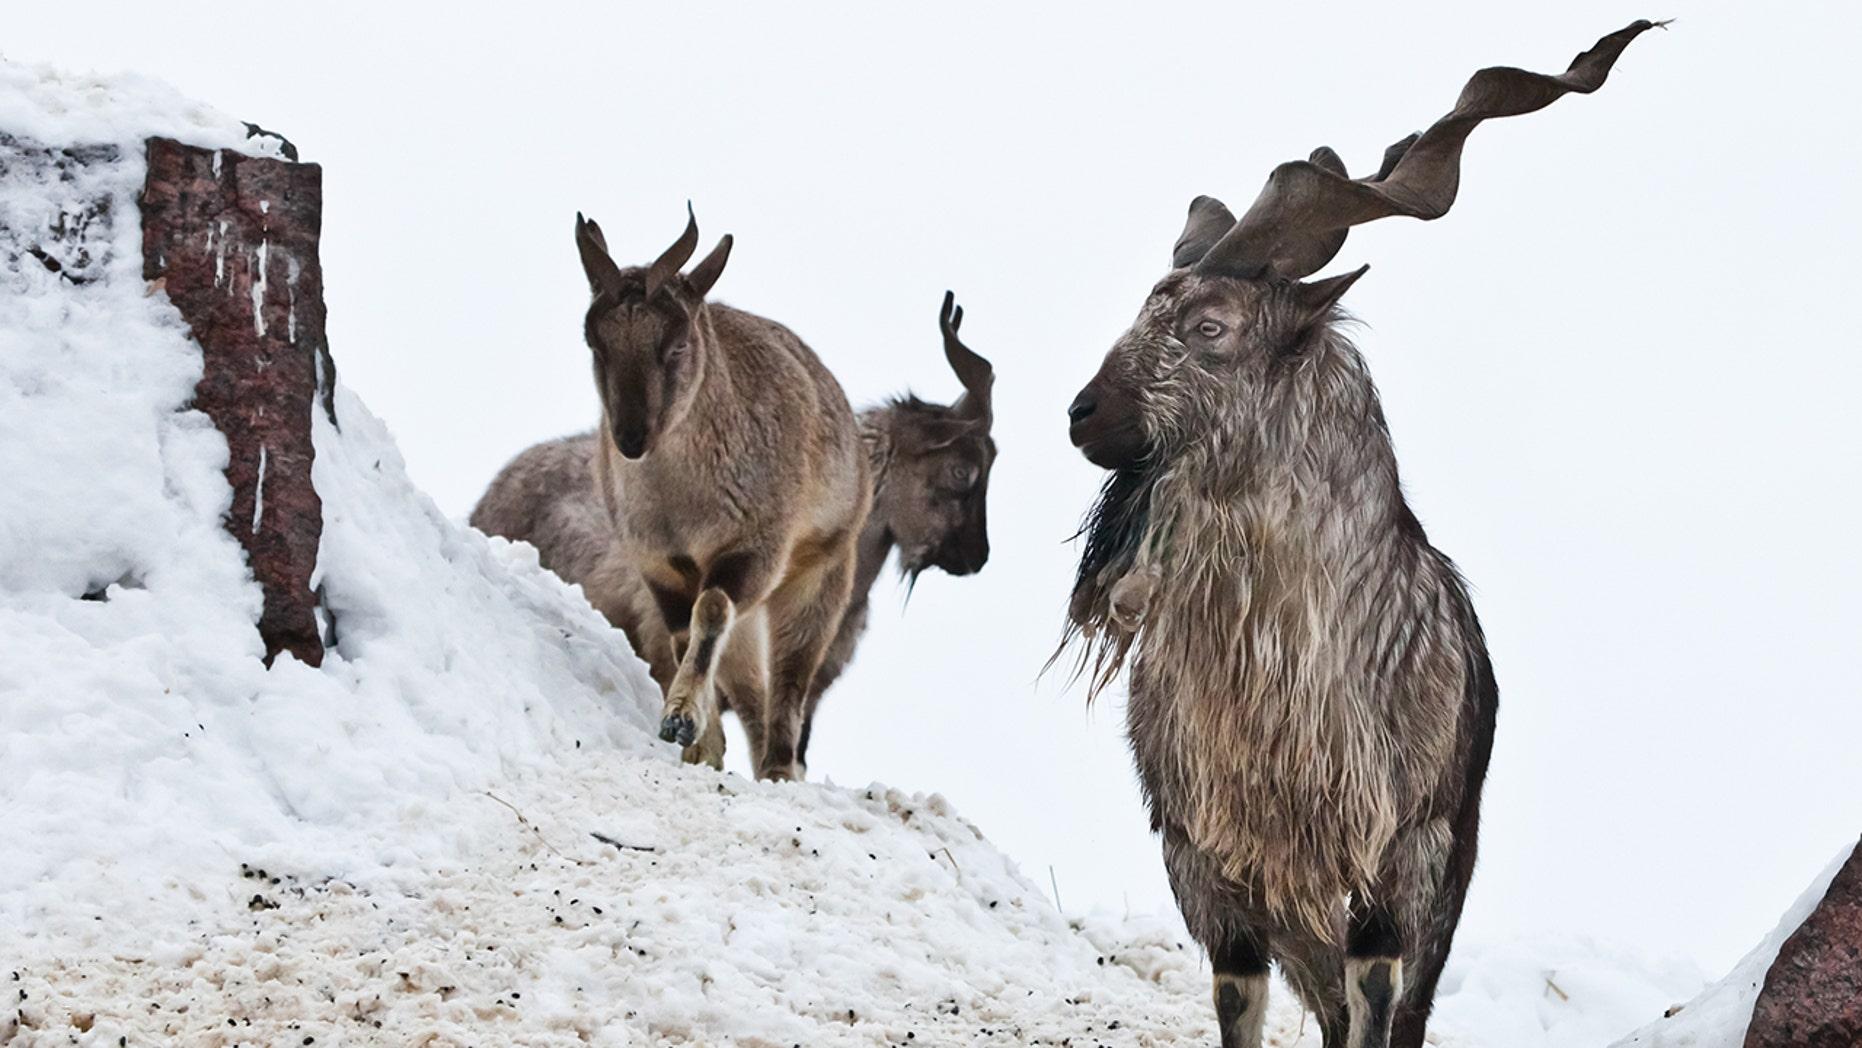 US Hunter Pays $110K to Kill 'Screw Horn Goat'